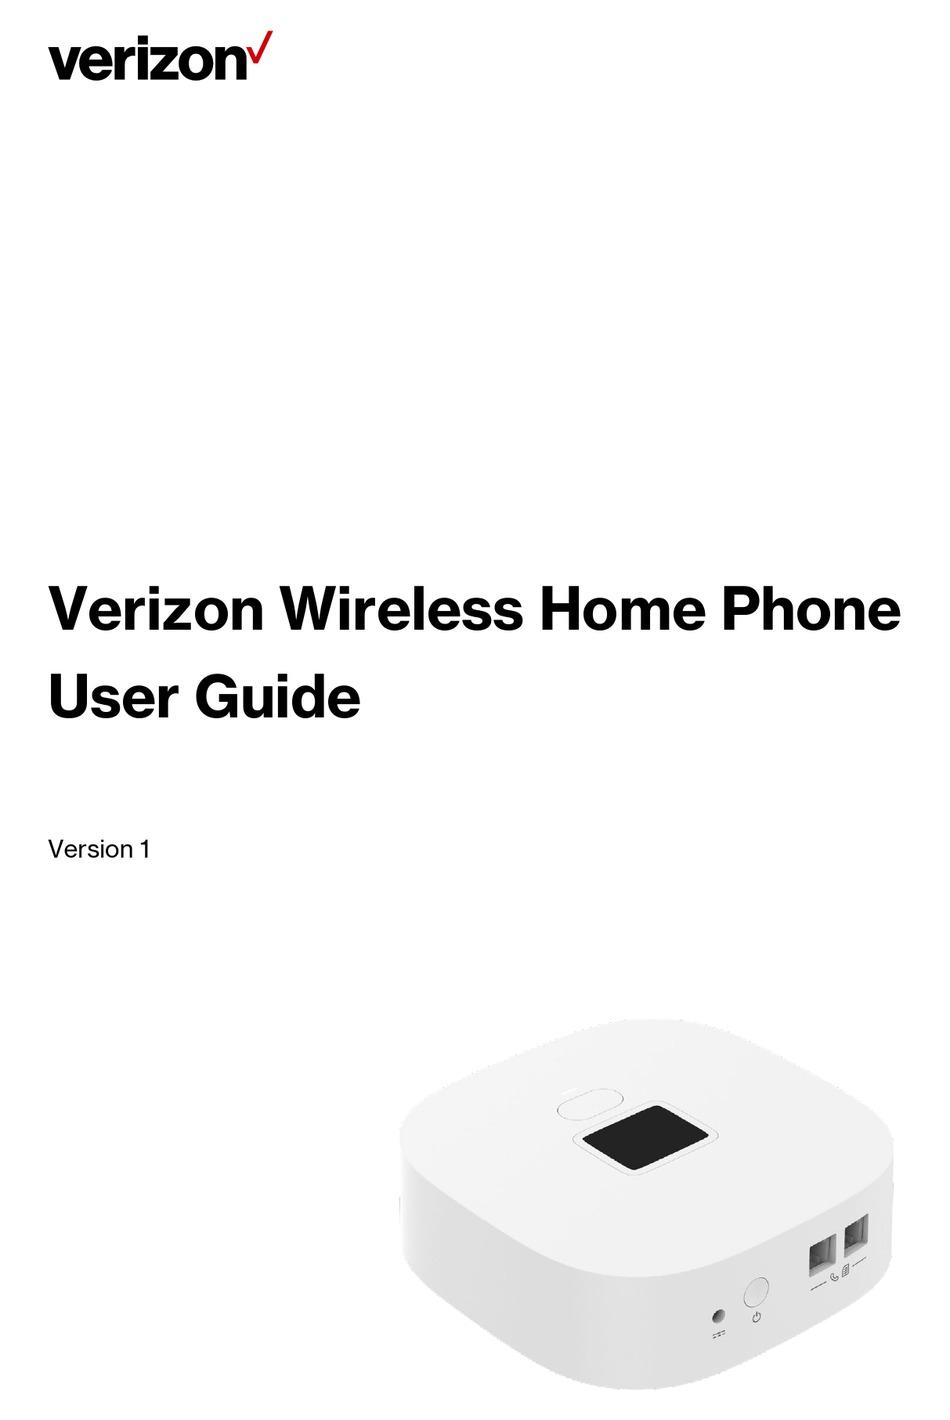 VERIZON WIRELESS HOME PHONE USER MANUAL Pdf Download